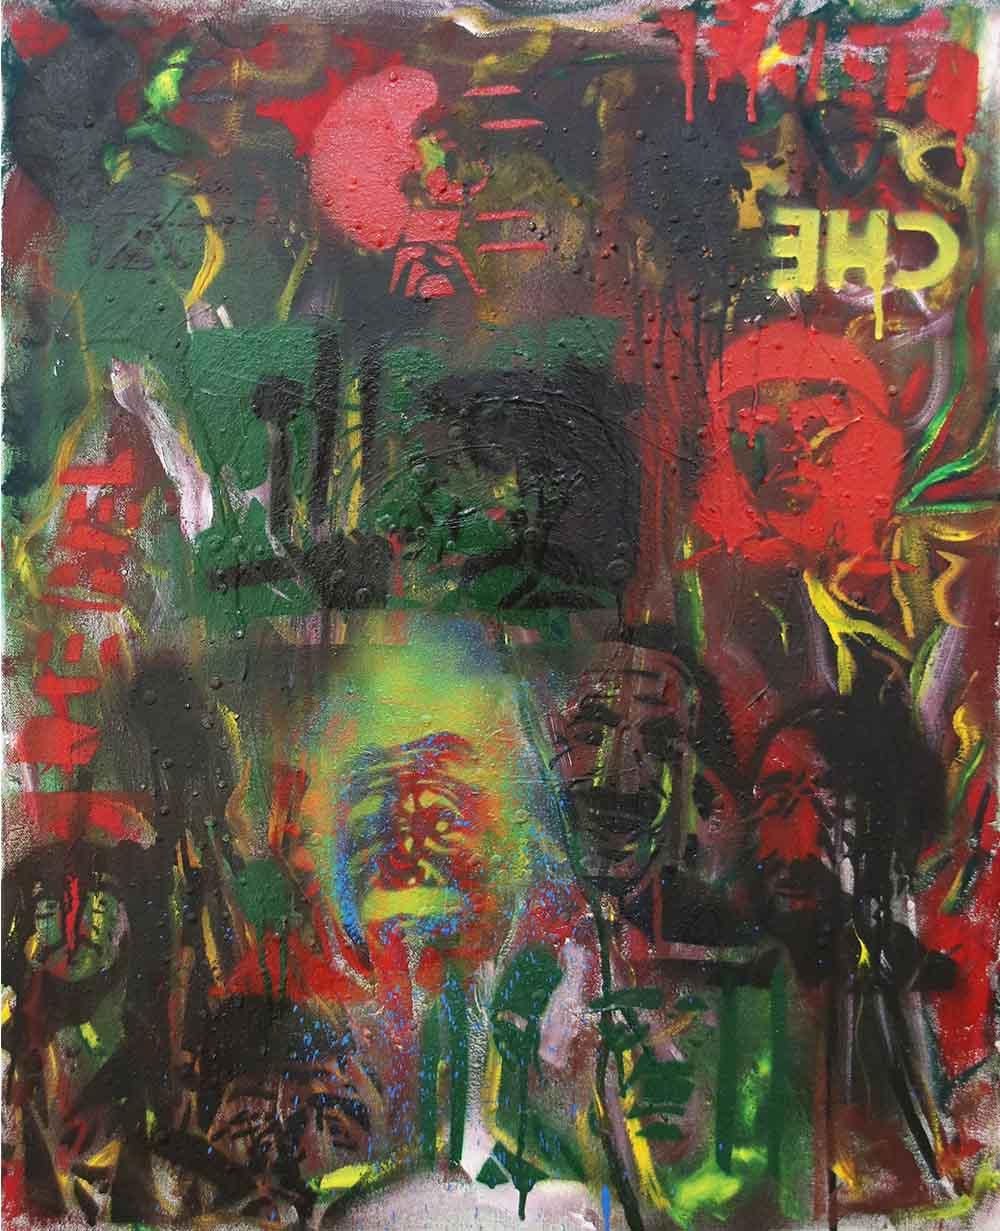 Gulwa Lindisipho They Rebel Tonight I 2019 mixed media on canvas 61 x 76 cm